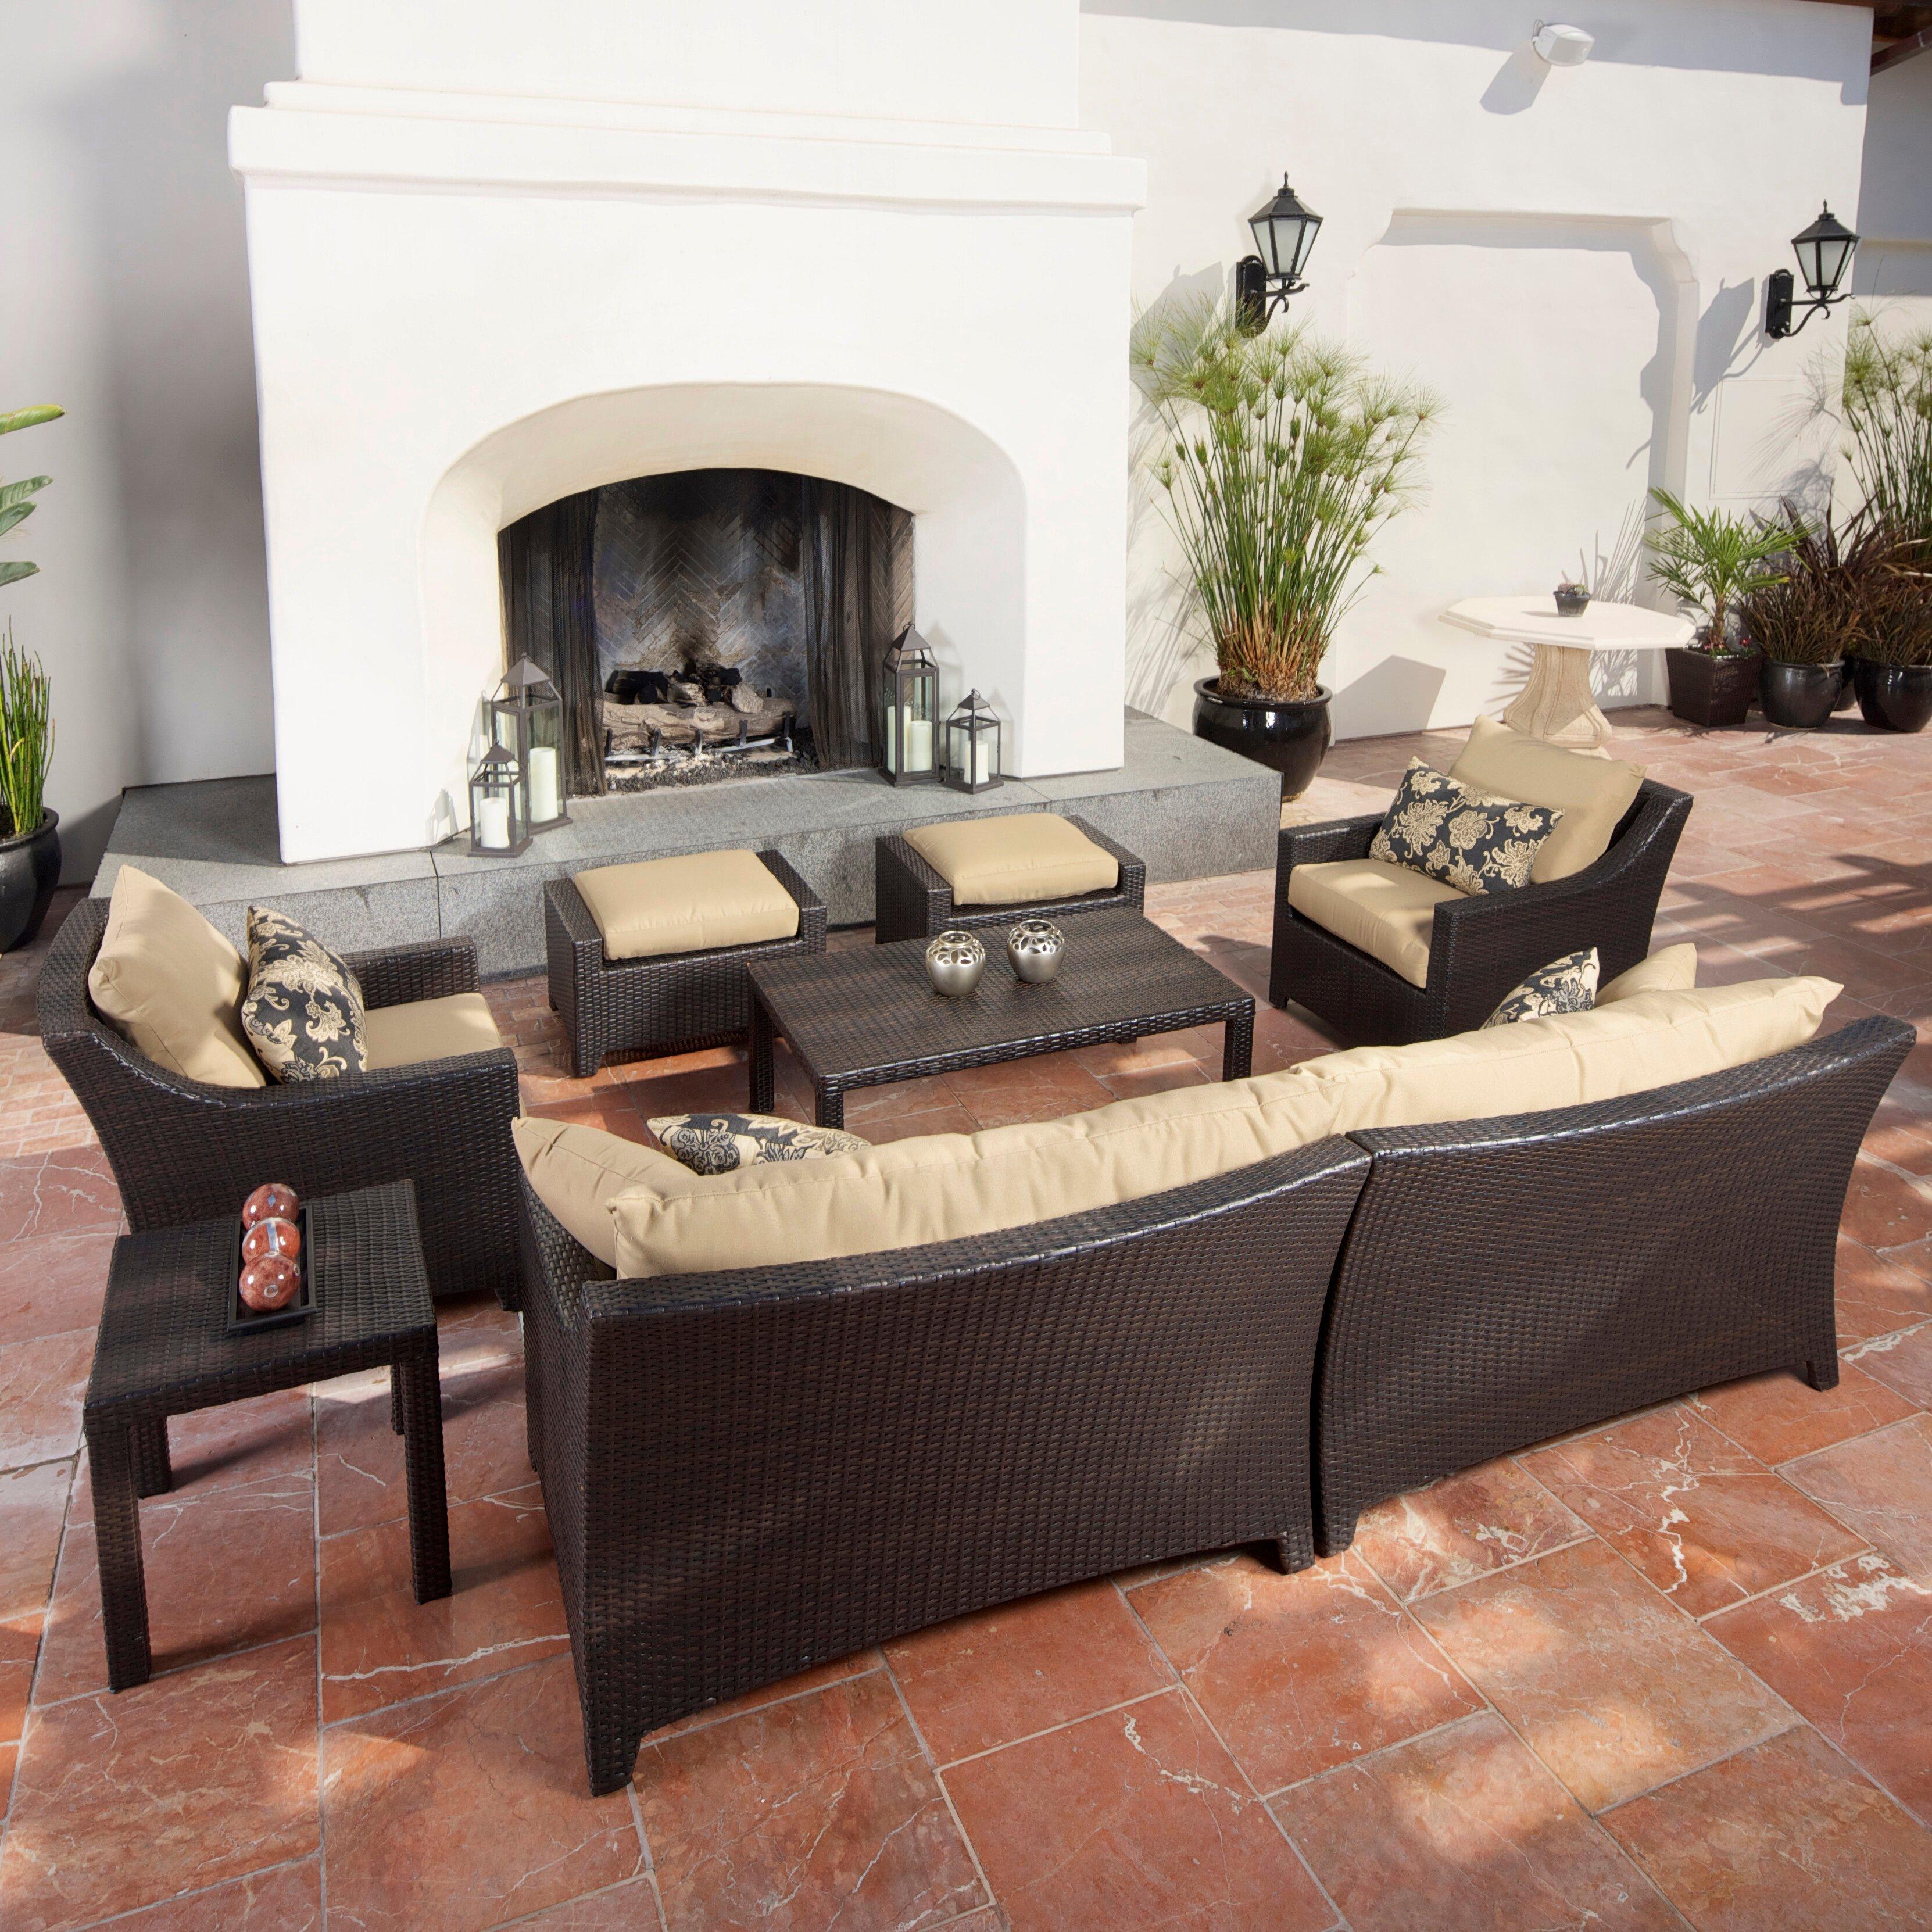 Patio Furniture Near Northridge Ca: Three Posts Northridge 7 Piece Deep Seating Group With